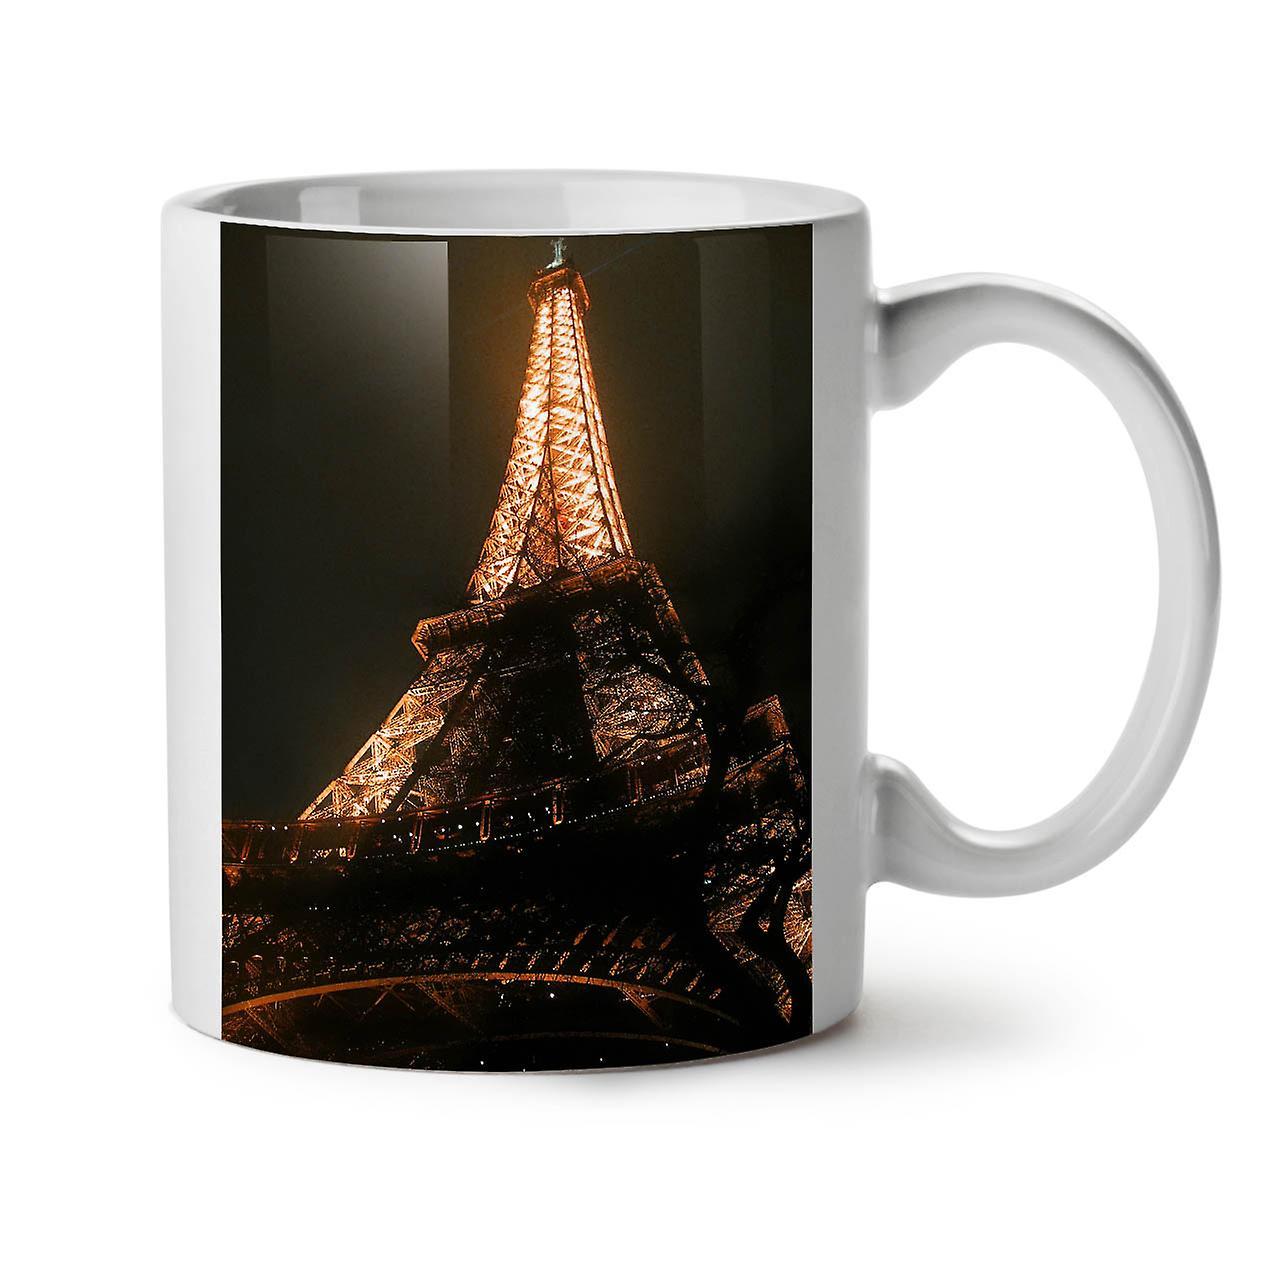 White Cool 11 Landmark Tower OzWellcoda Tea Coffee New Mug Ceramic Nkw8n0OPZX